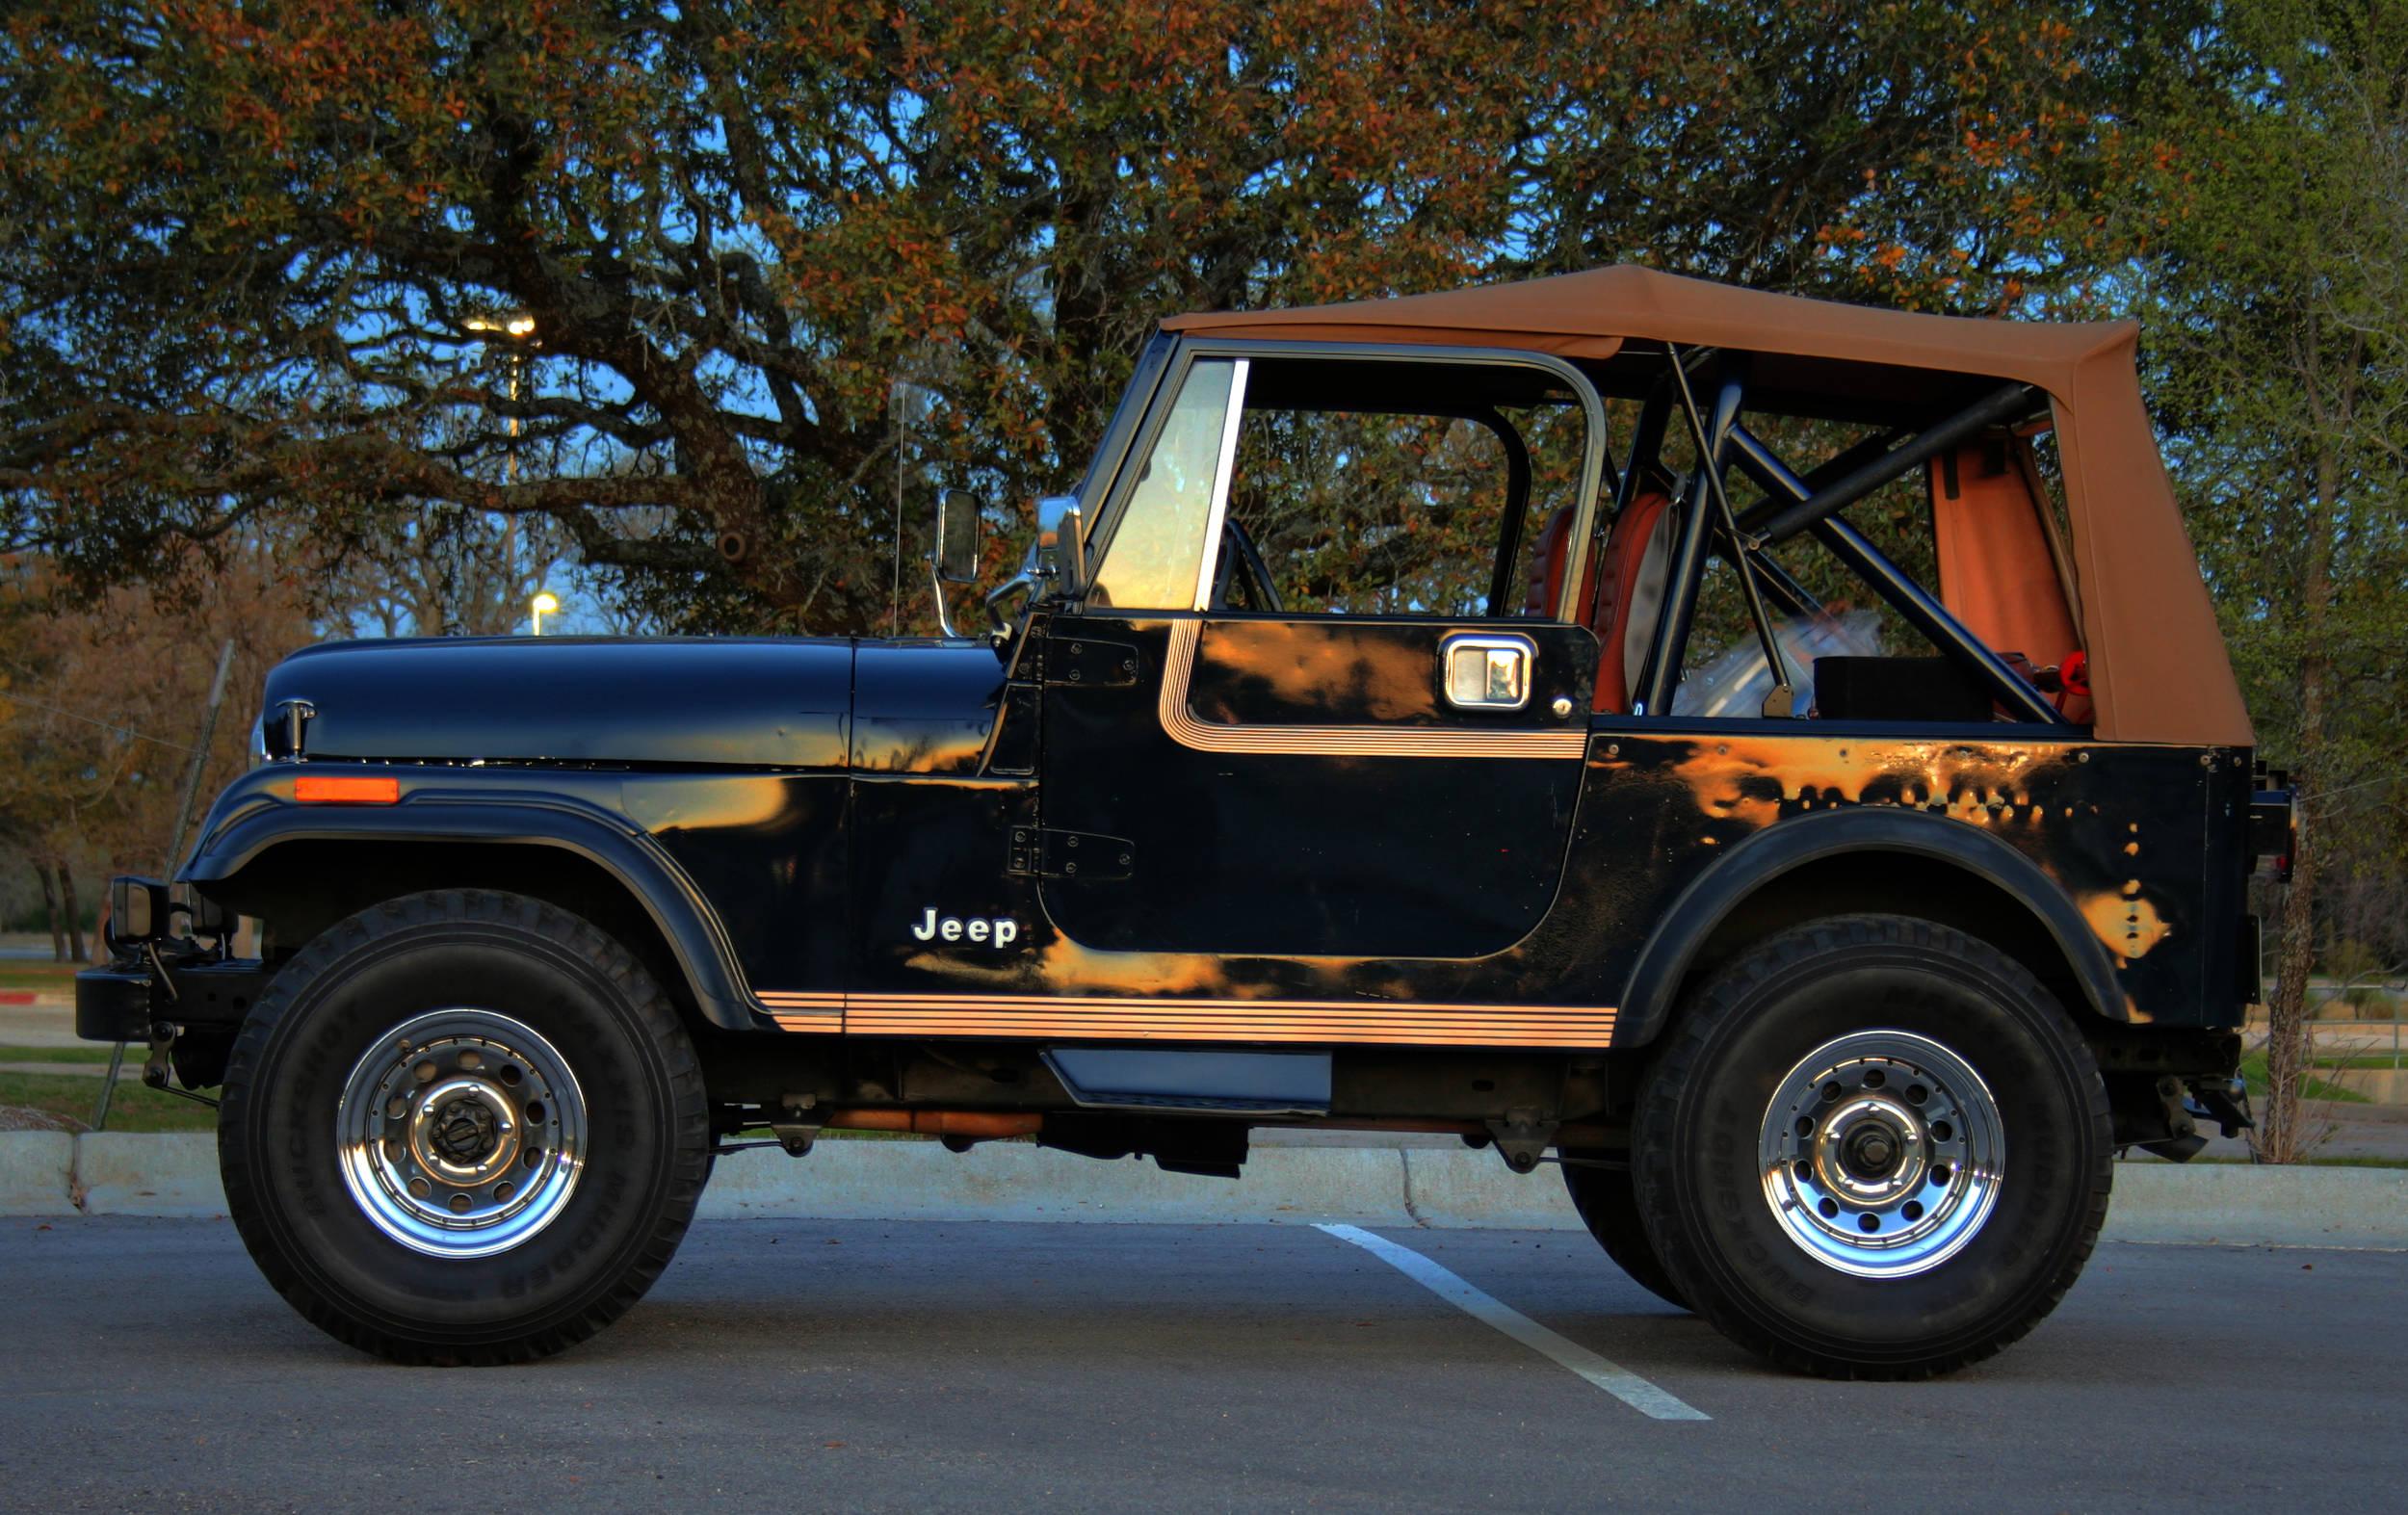 Jeep_HDR2.jpg